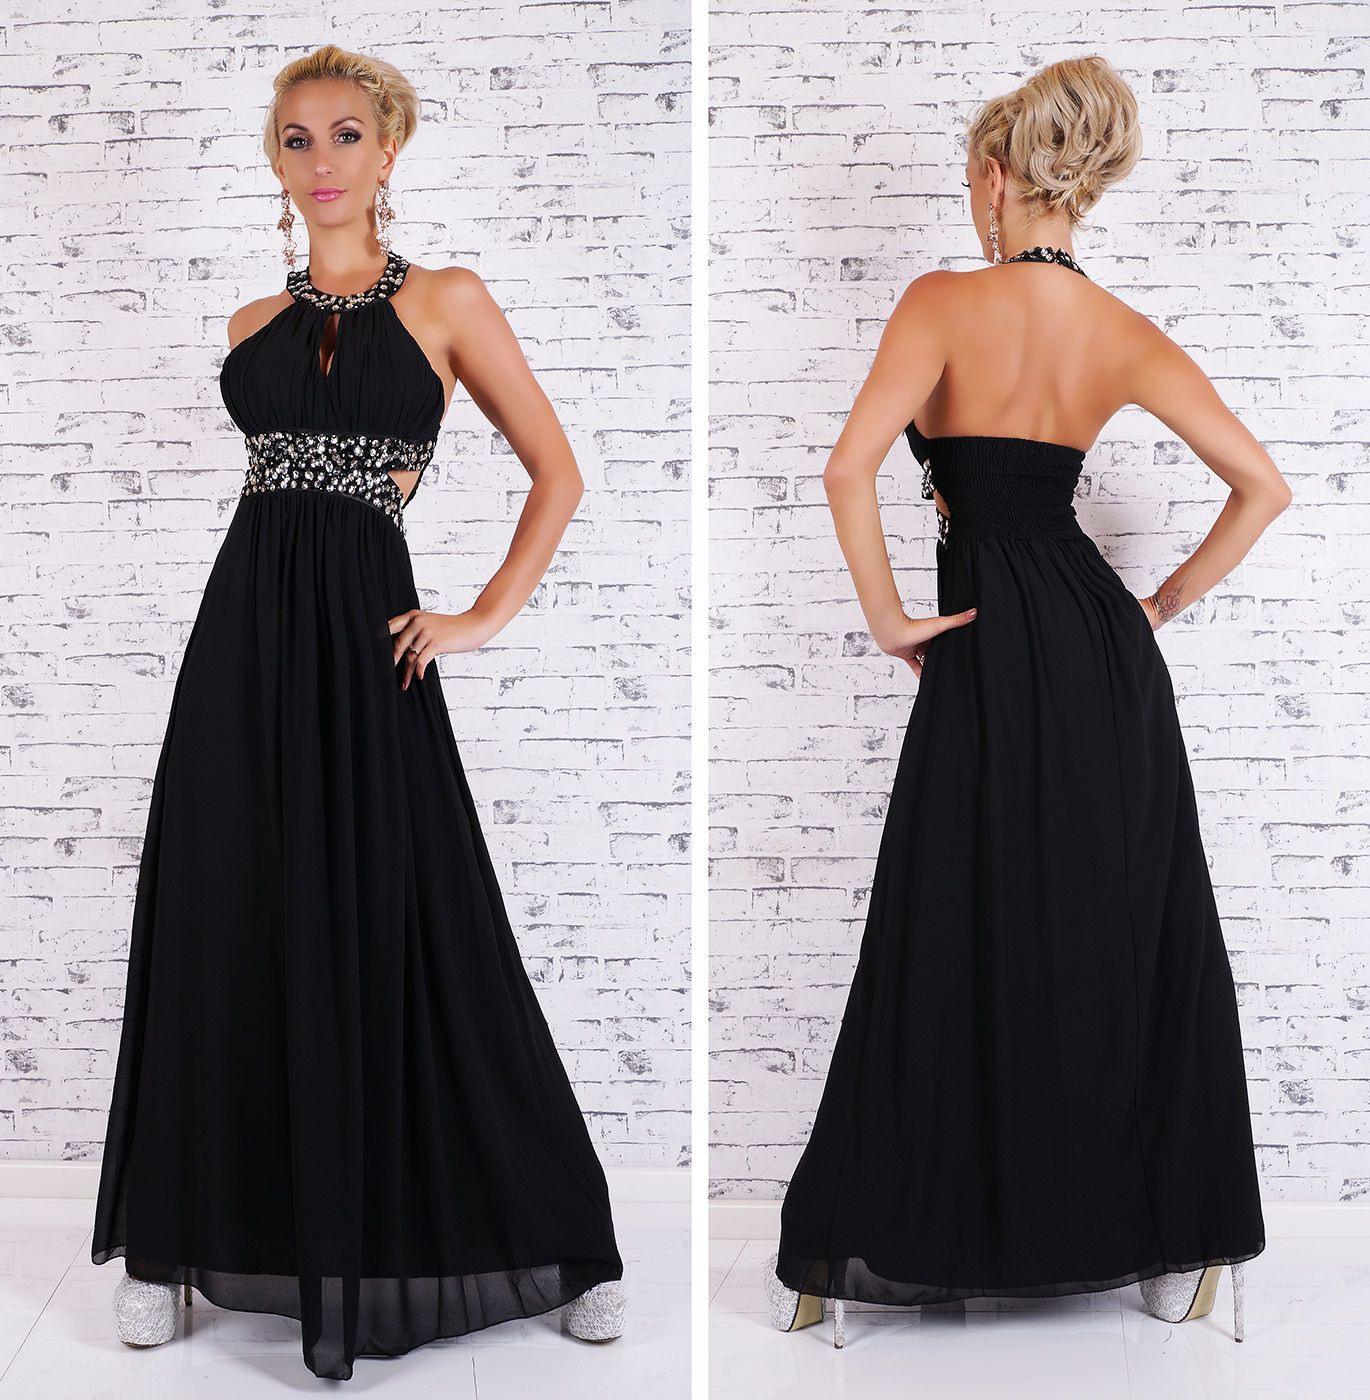 15 Großartig Abendkleid Ebay GalerieDesigner Genial Abendkleid Ebay Vertrieb